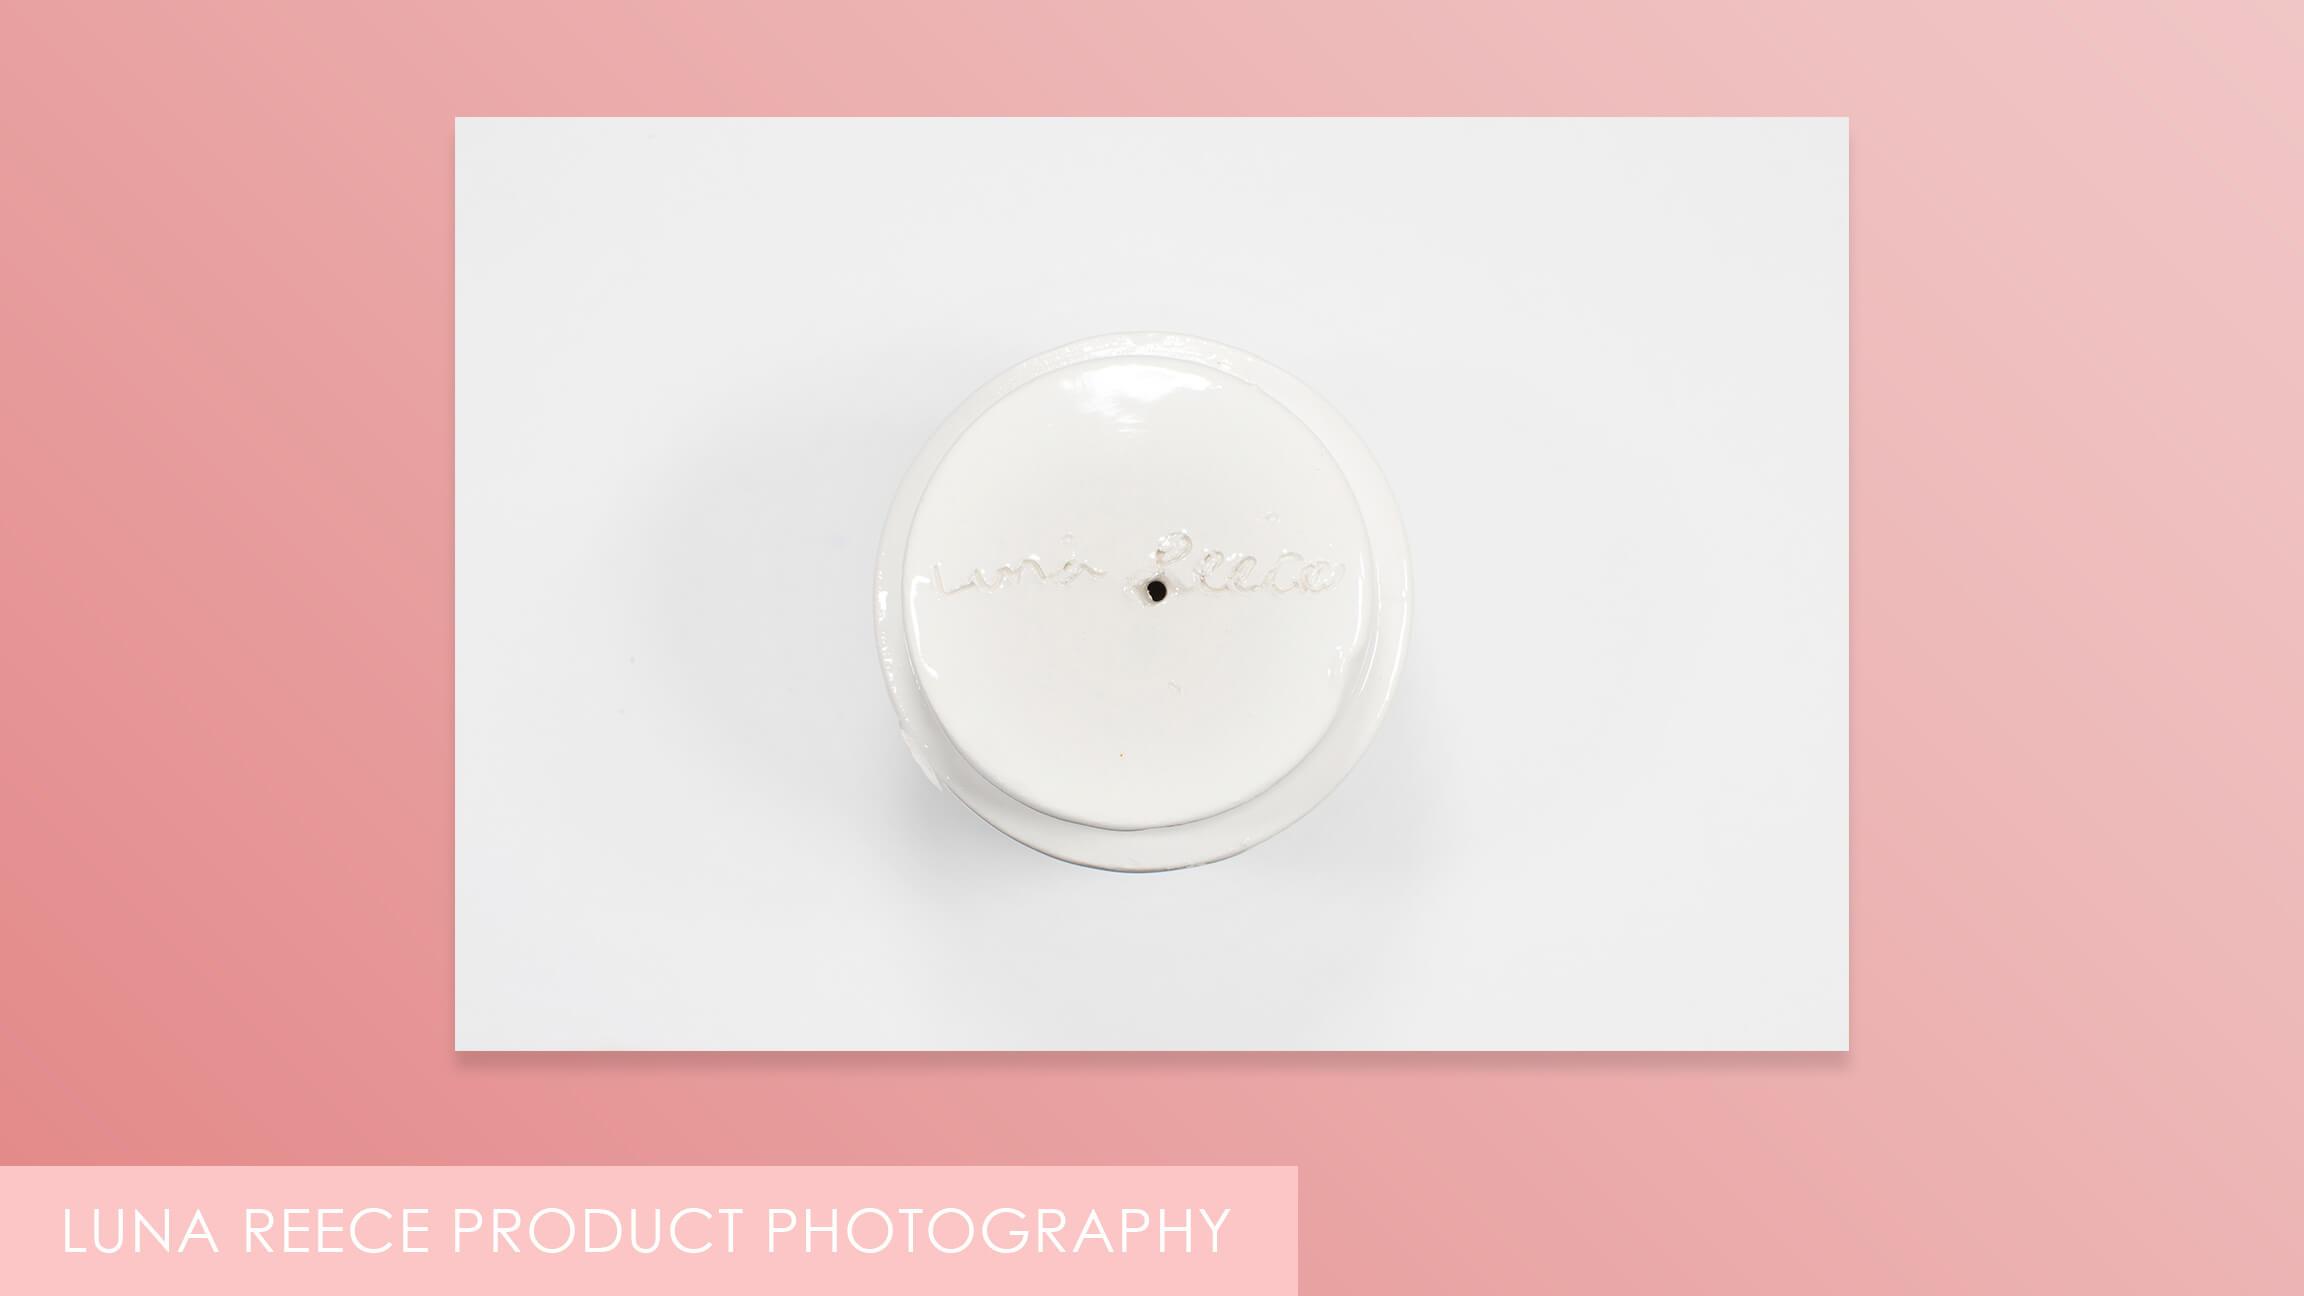 the-four-design-luna-reece-product-photography-3.jpg